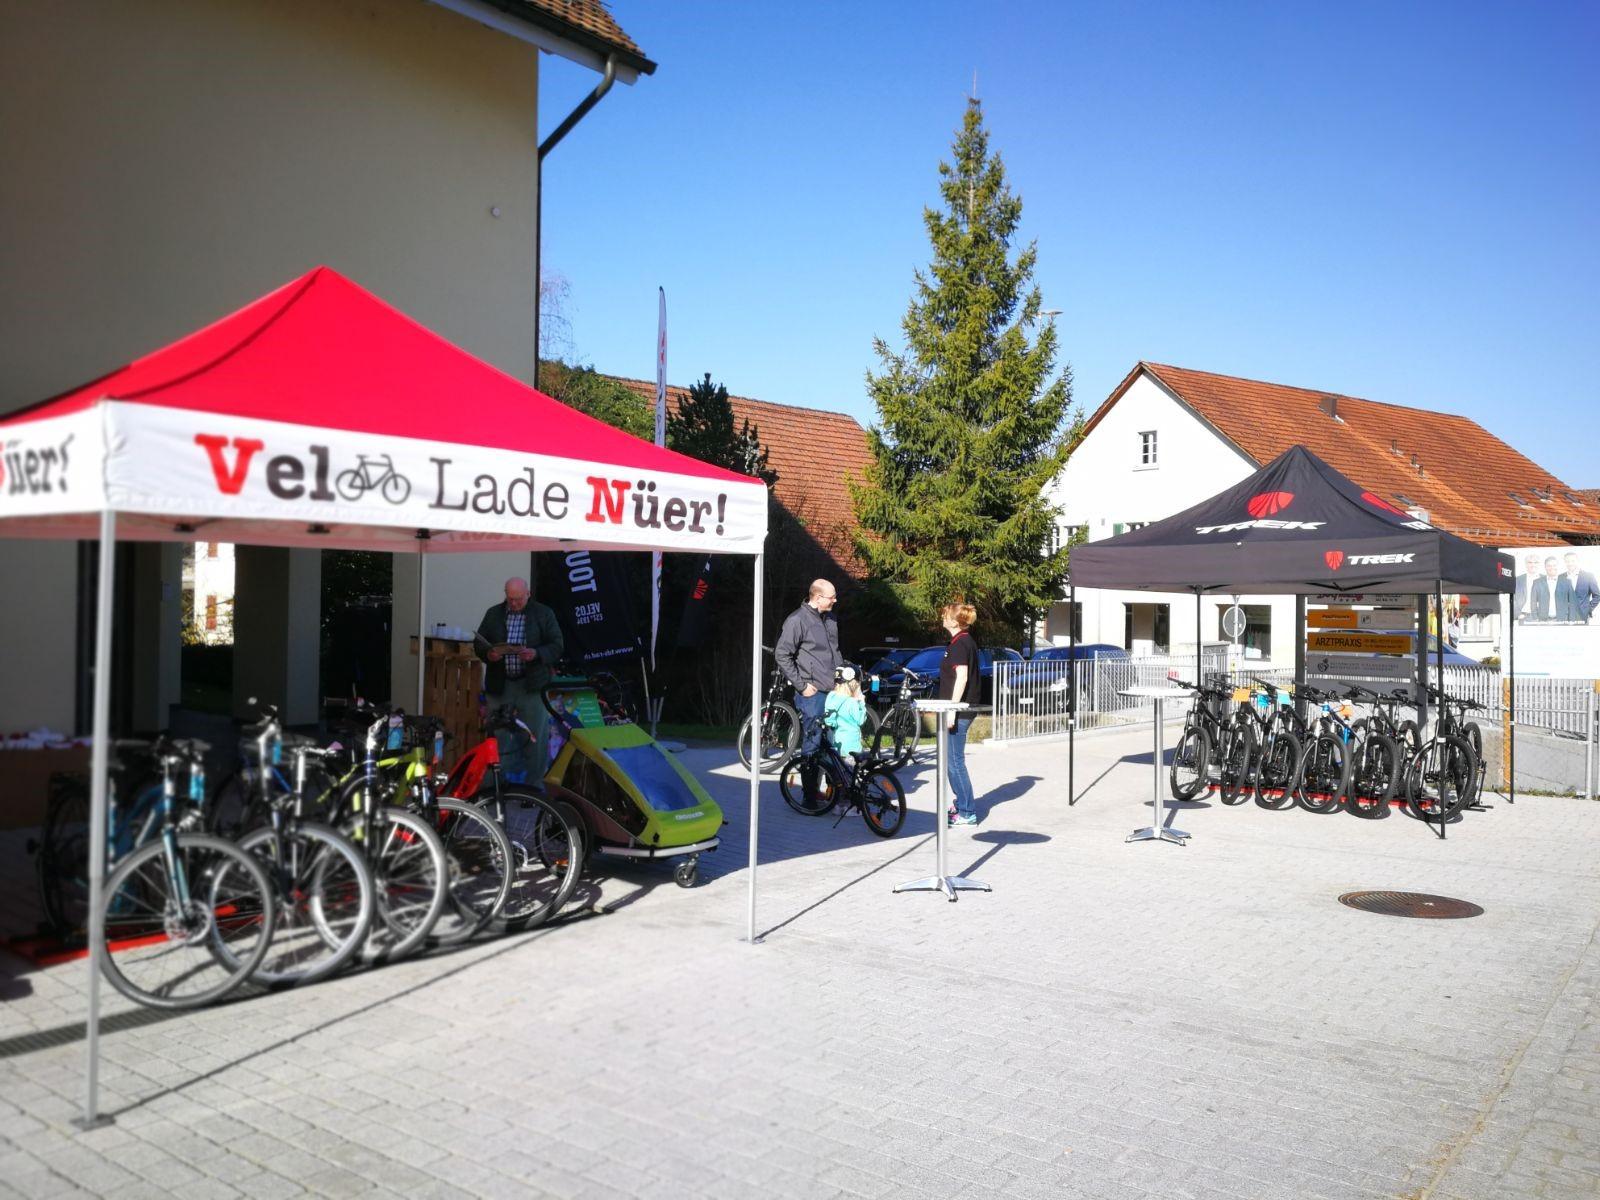 Velolade Nueri GmbH